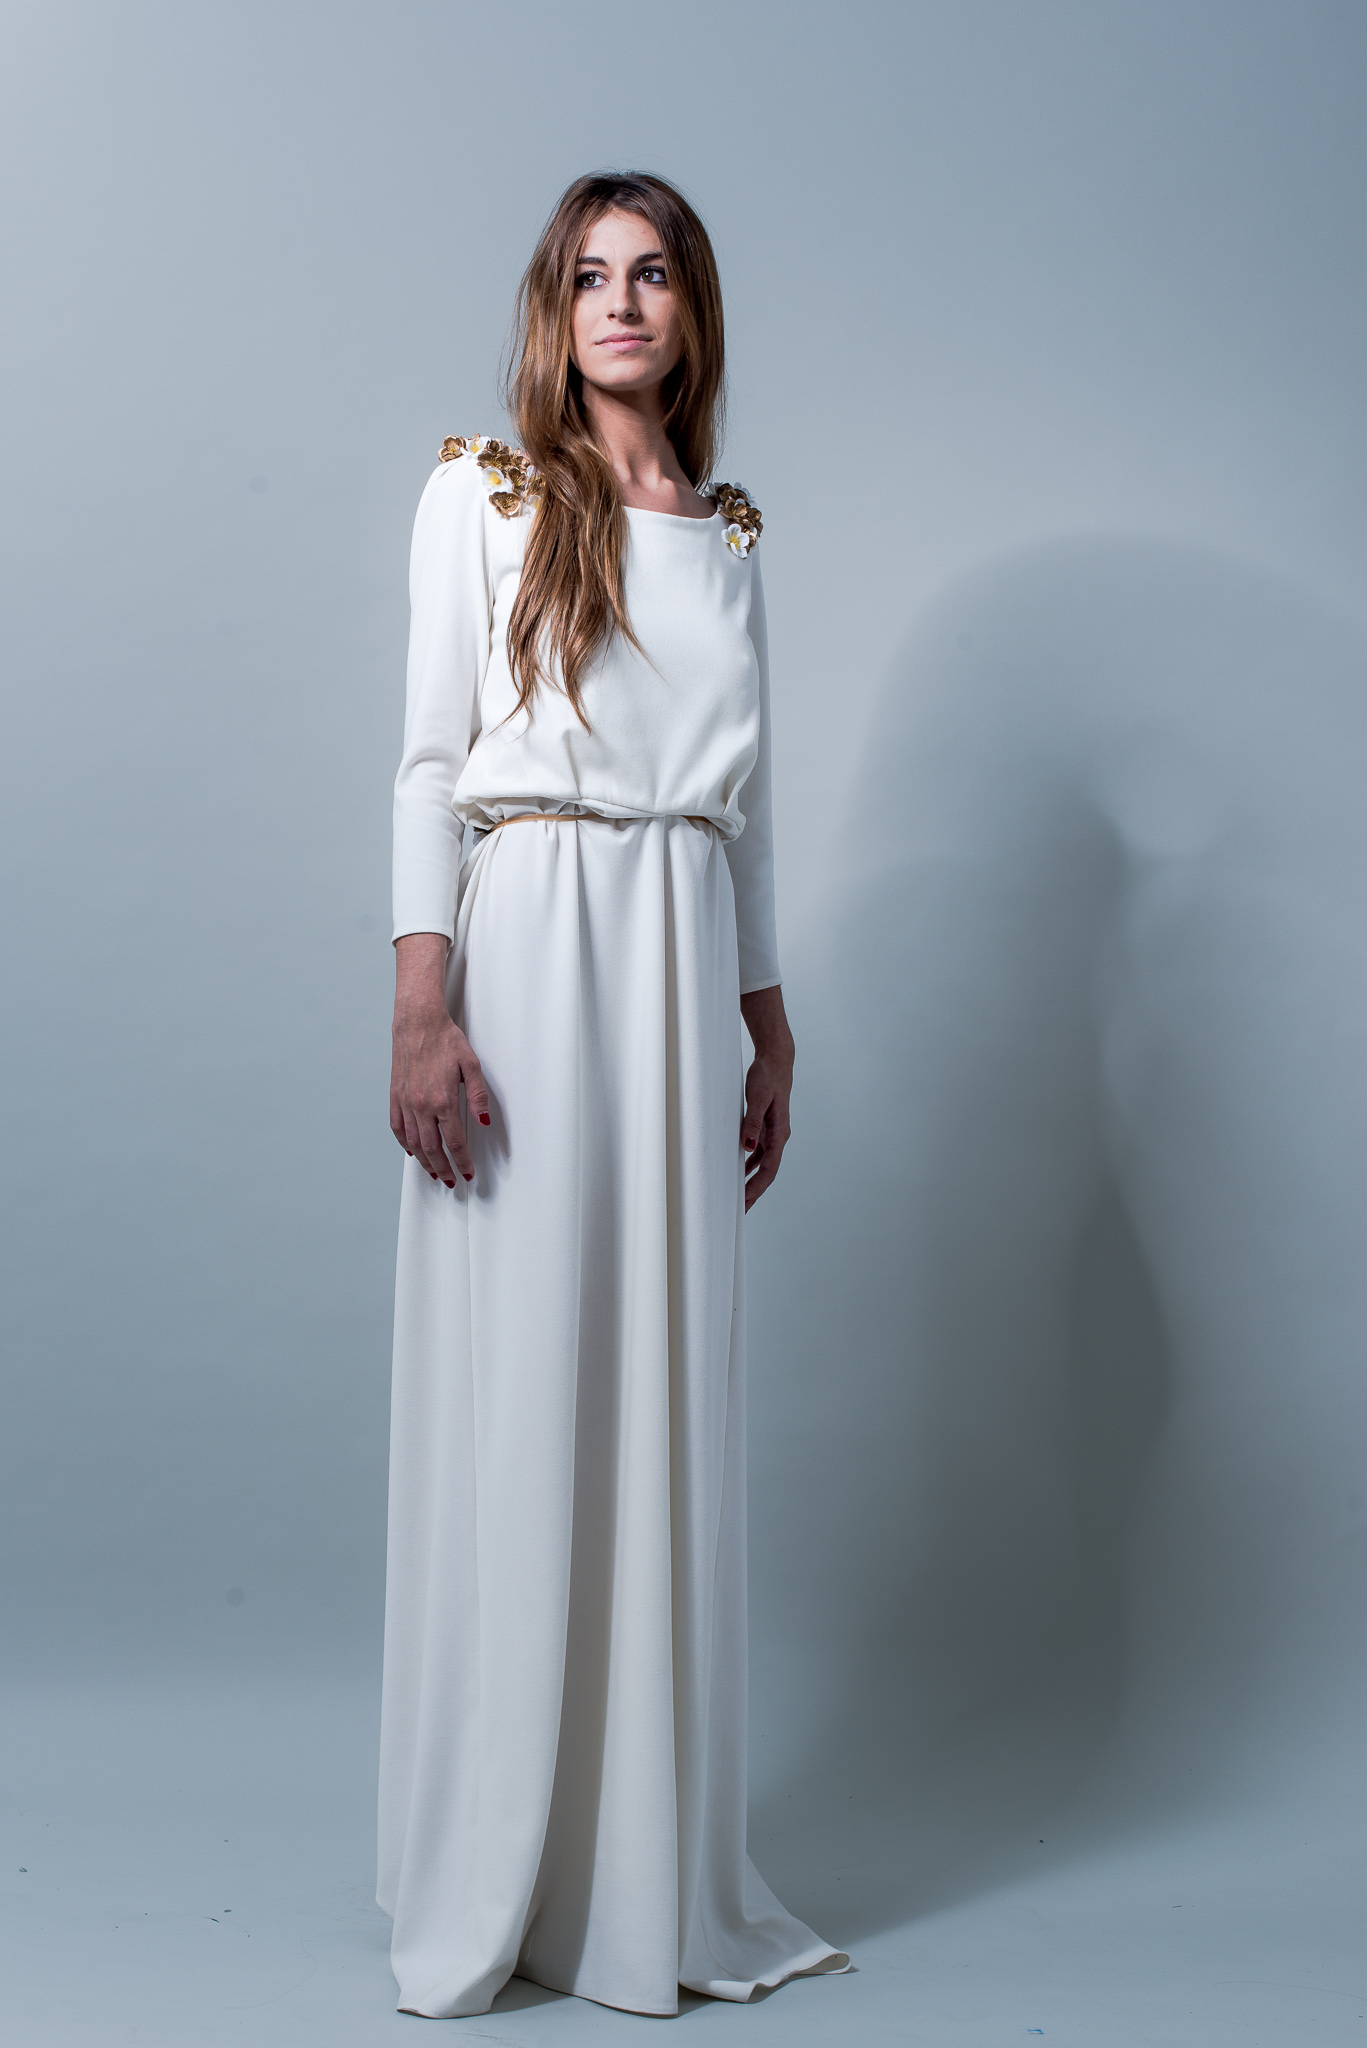 Vestidos de novia pret a porter | El blog de Ana Suero